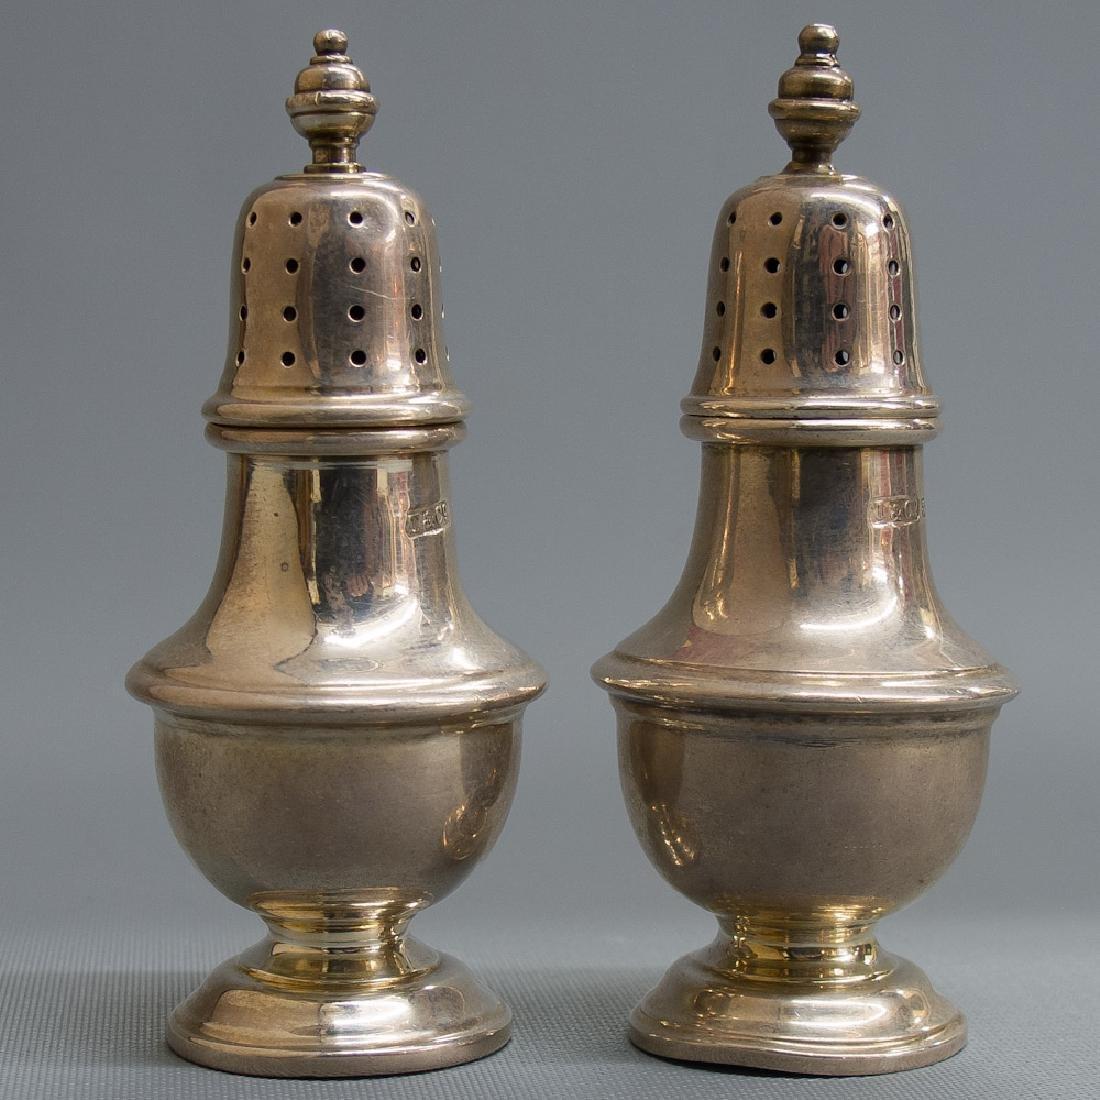 Tiffany & Co Silver Salt & Pepper Pots